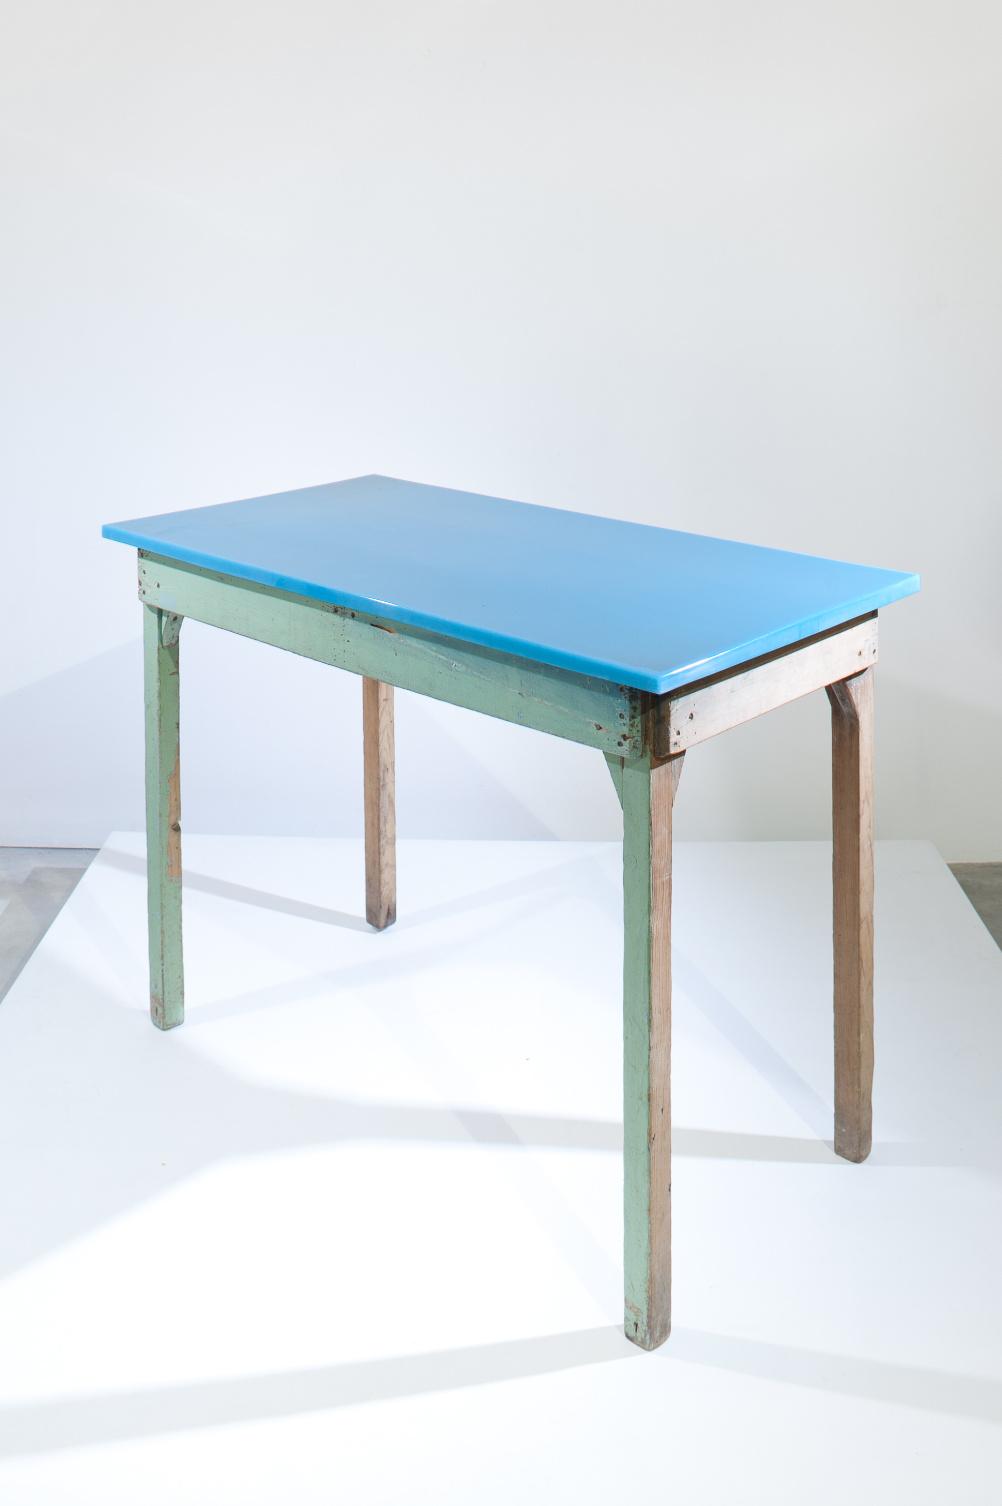 Flat Tables